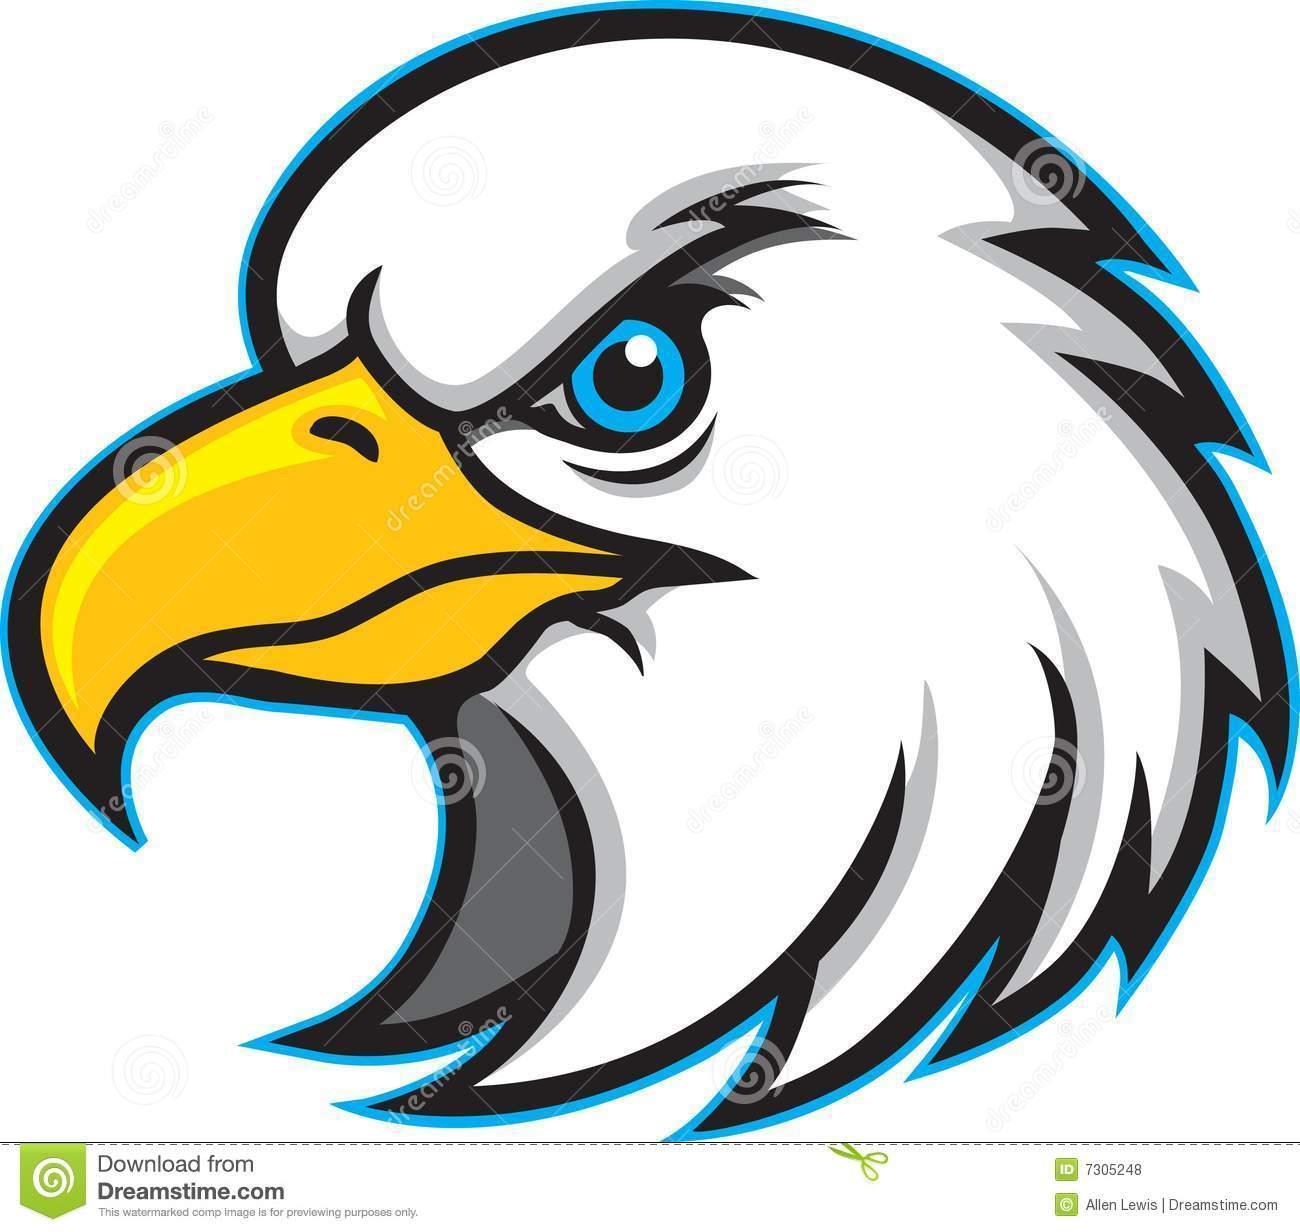 Hawk mascot clipart clip free library Free hawk mascot clipart 4 » Clipart Portal clip free library